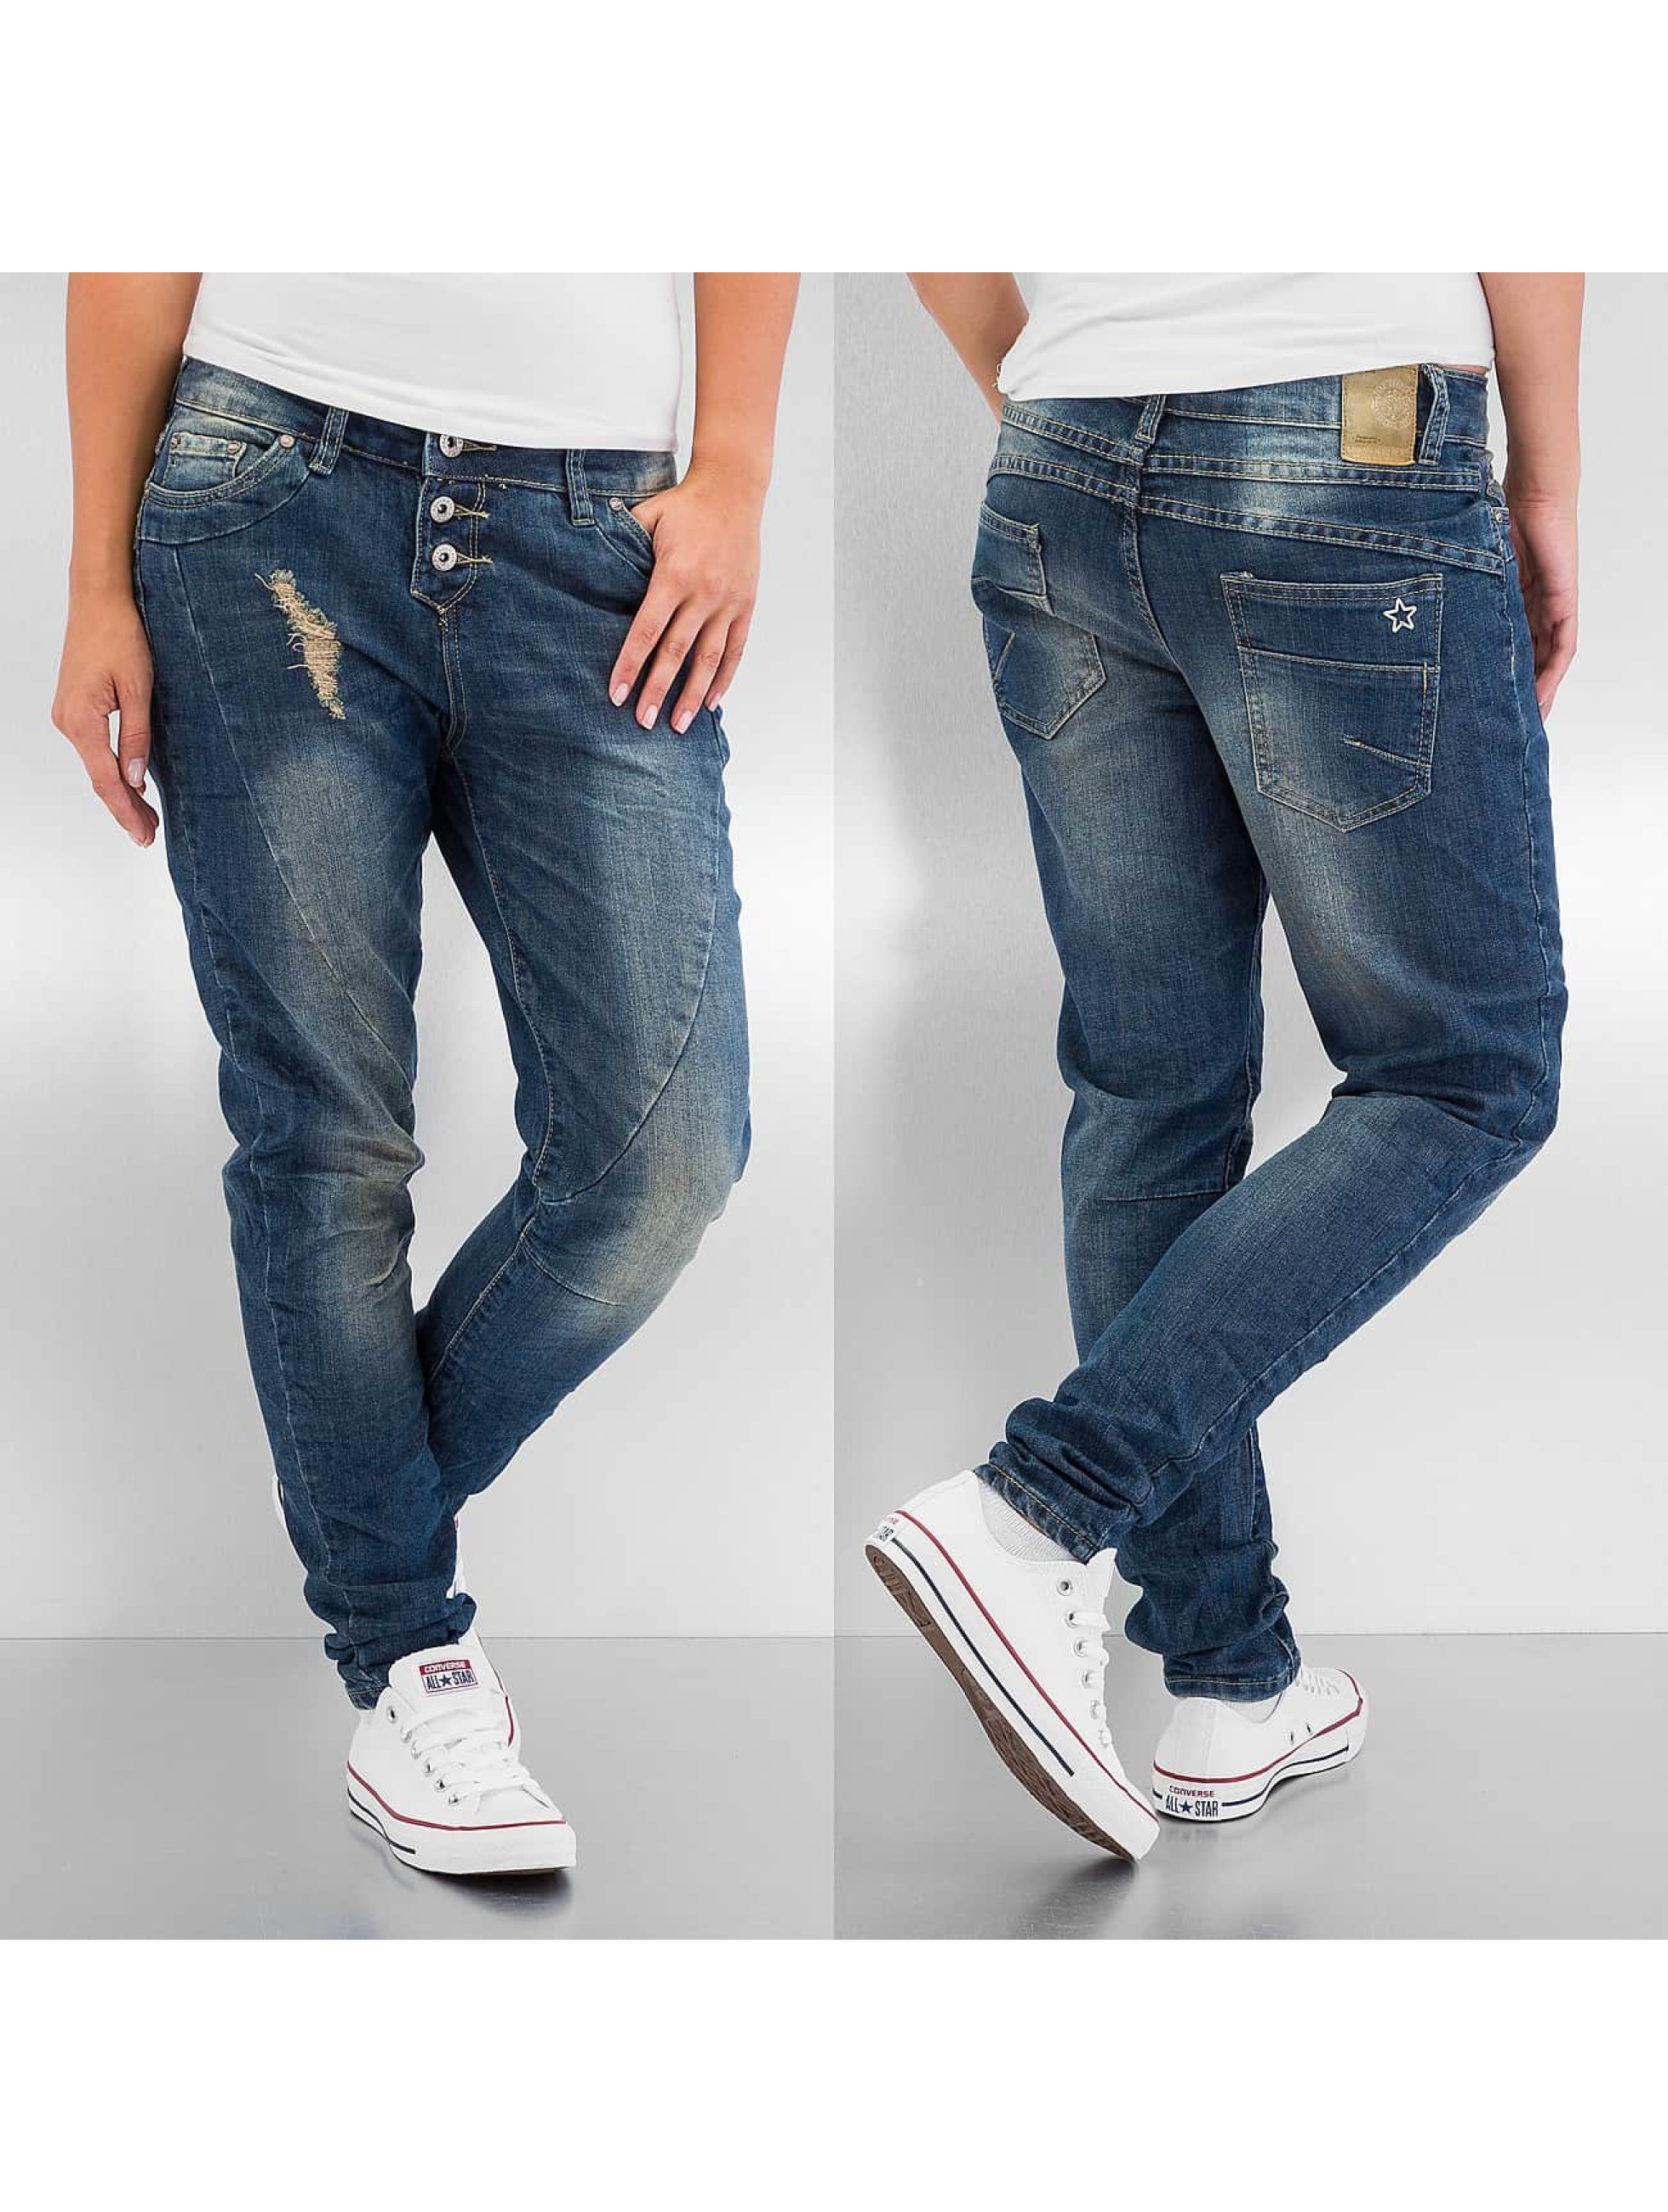 urban surface damen jeans boyfriend used ebay. Black Bedroom Furniture Sets. Home Design Ideas